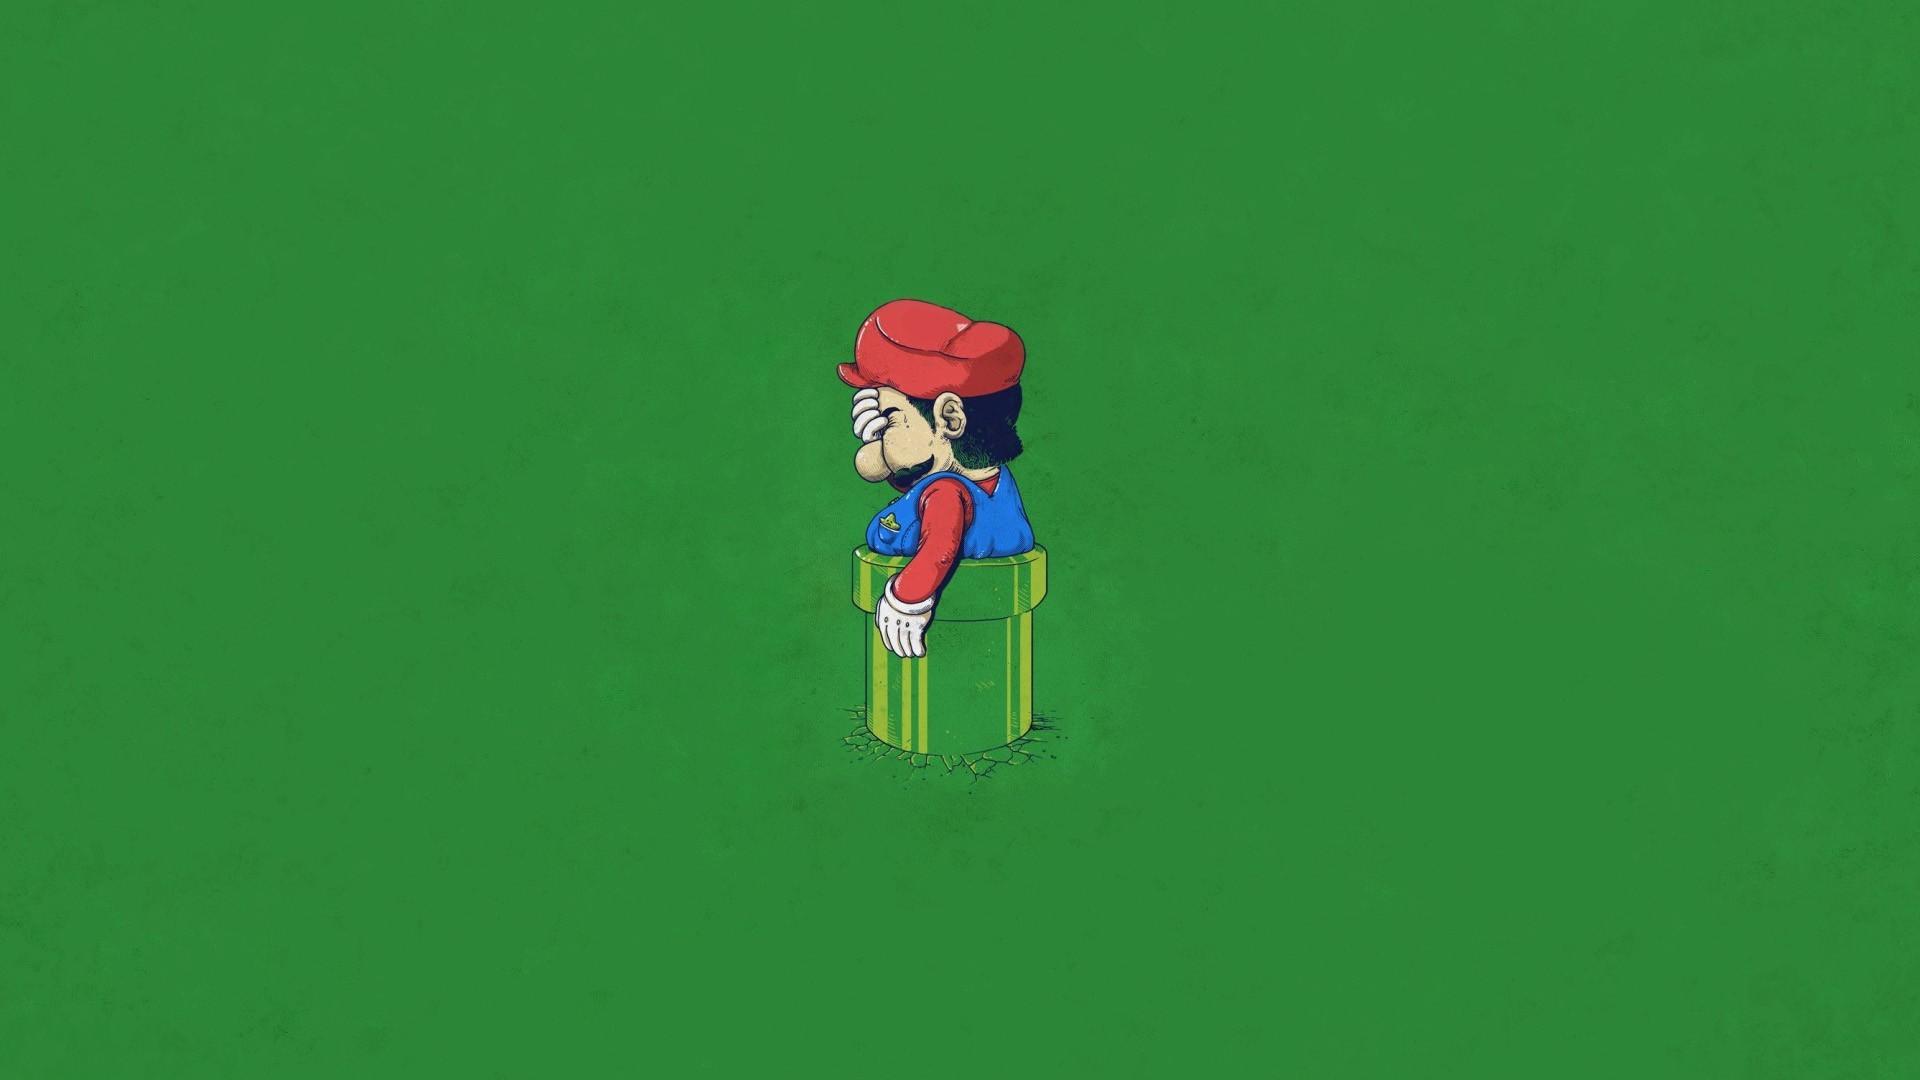 WallpapersWide.com | Mario HD Desktop Wallpapers for ...